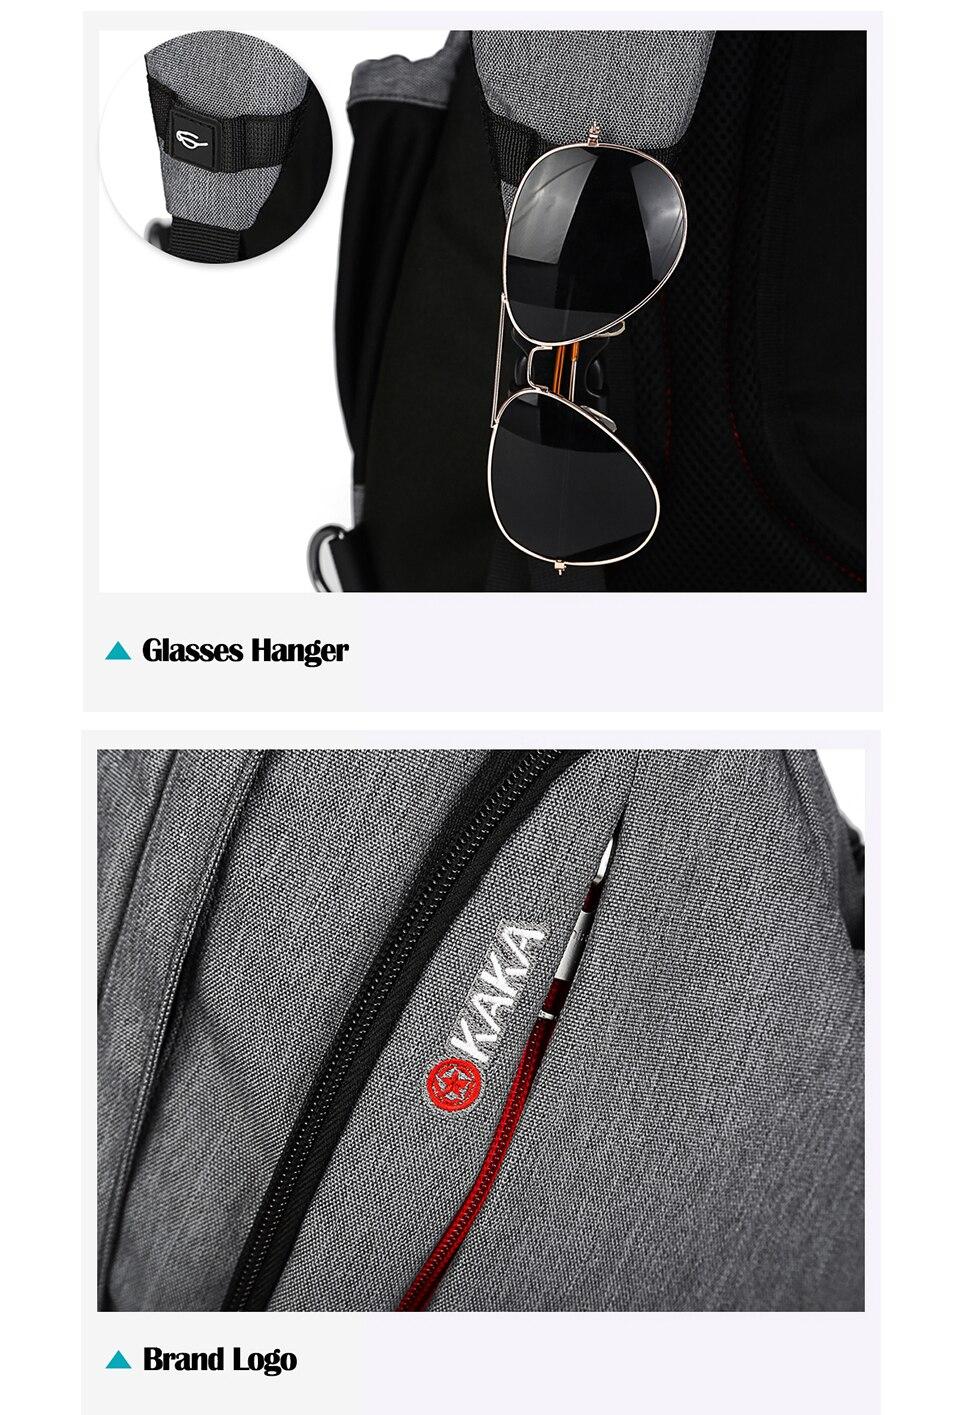 HTB1G59LnRDH8KJjSspnq6zNAVXa0 - Male Chest Bag with USB Charging and Anti Theft-Male Chest Bag with USB Charging and Anti Theft